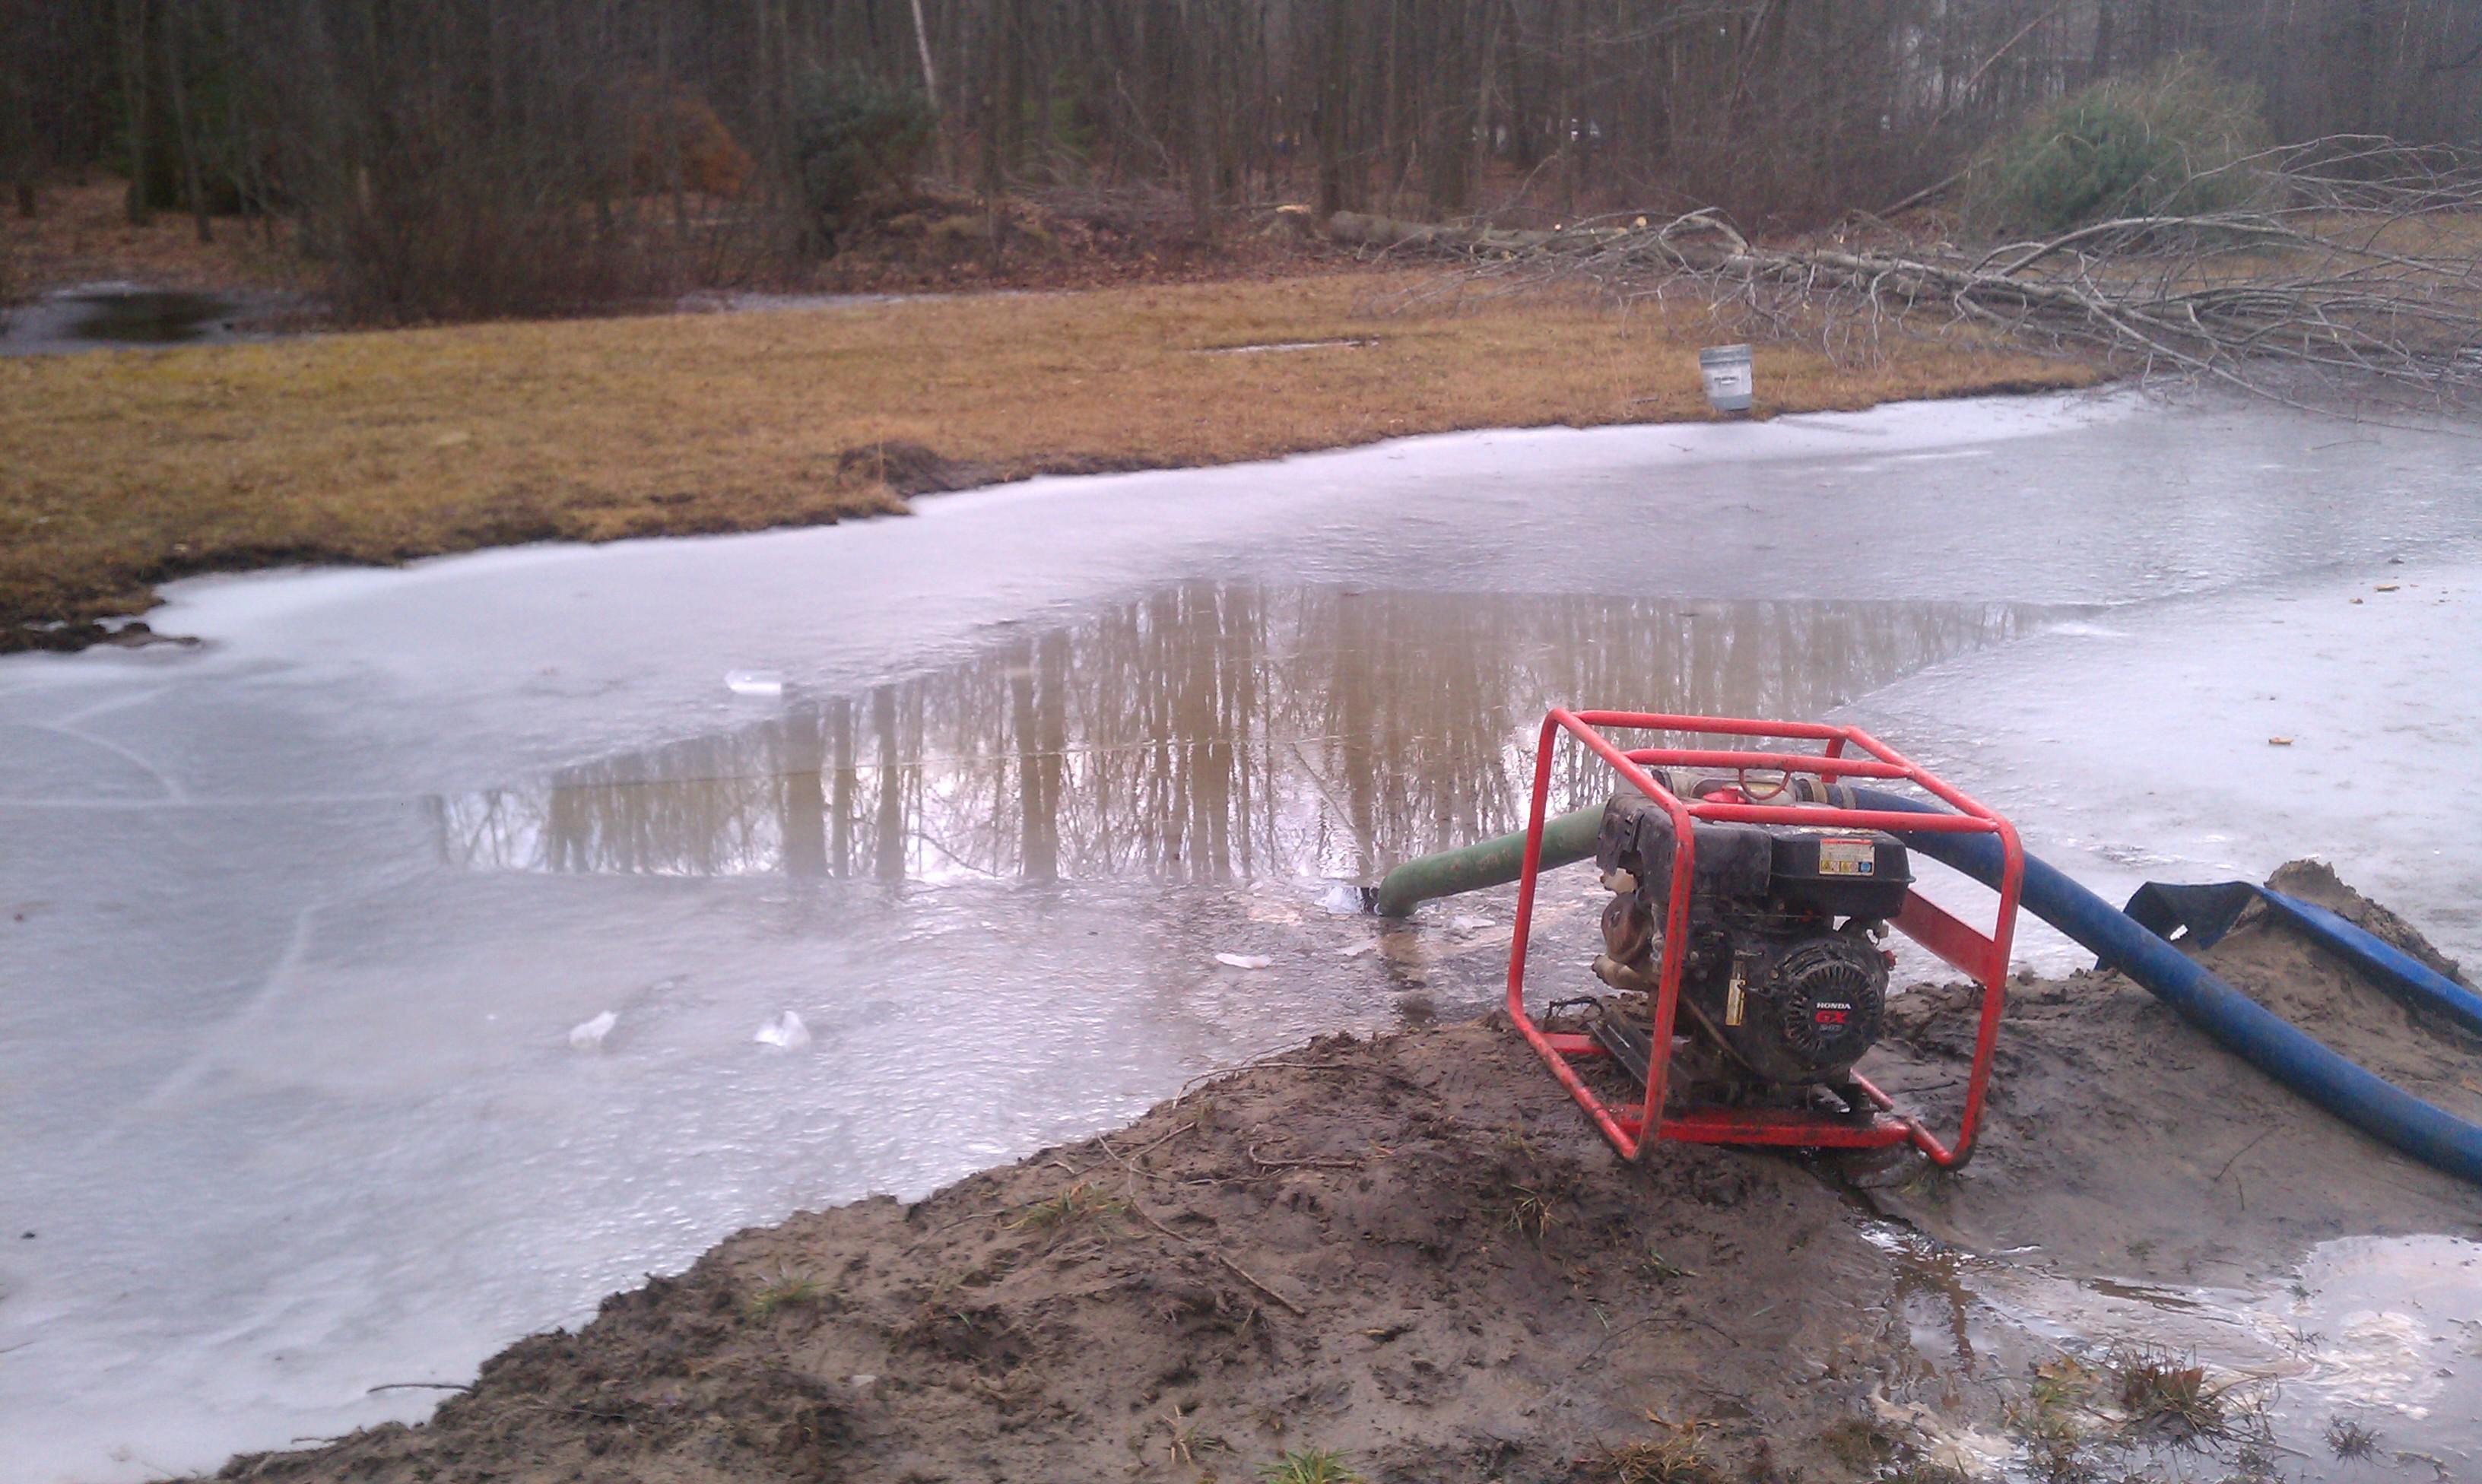 Oakley (N Bingham Farms, Michigan Detention pond enlarge to prevent flooding MI) (6).jpg